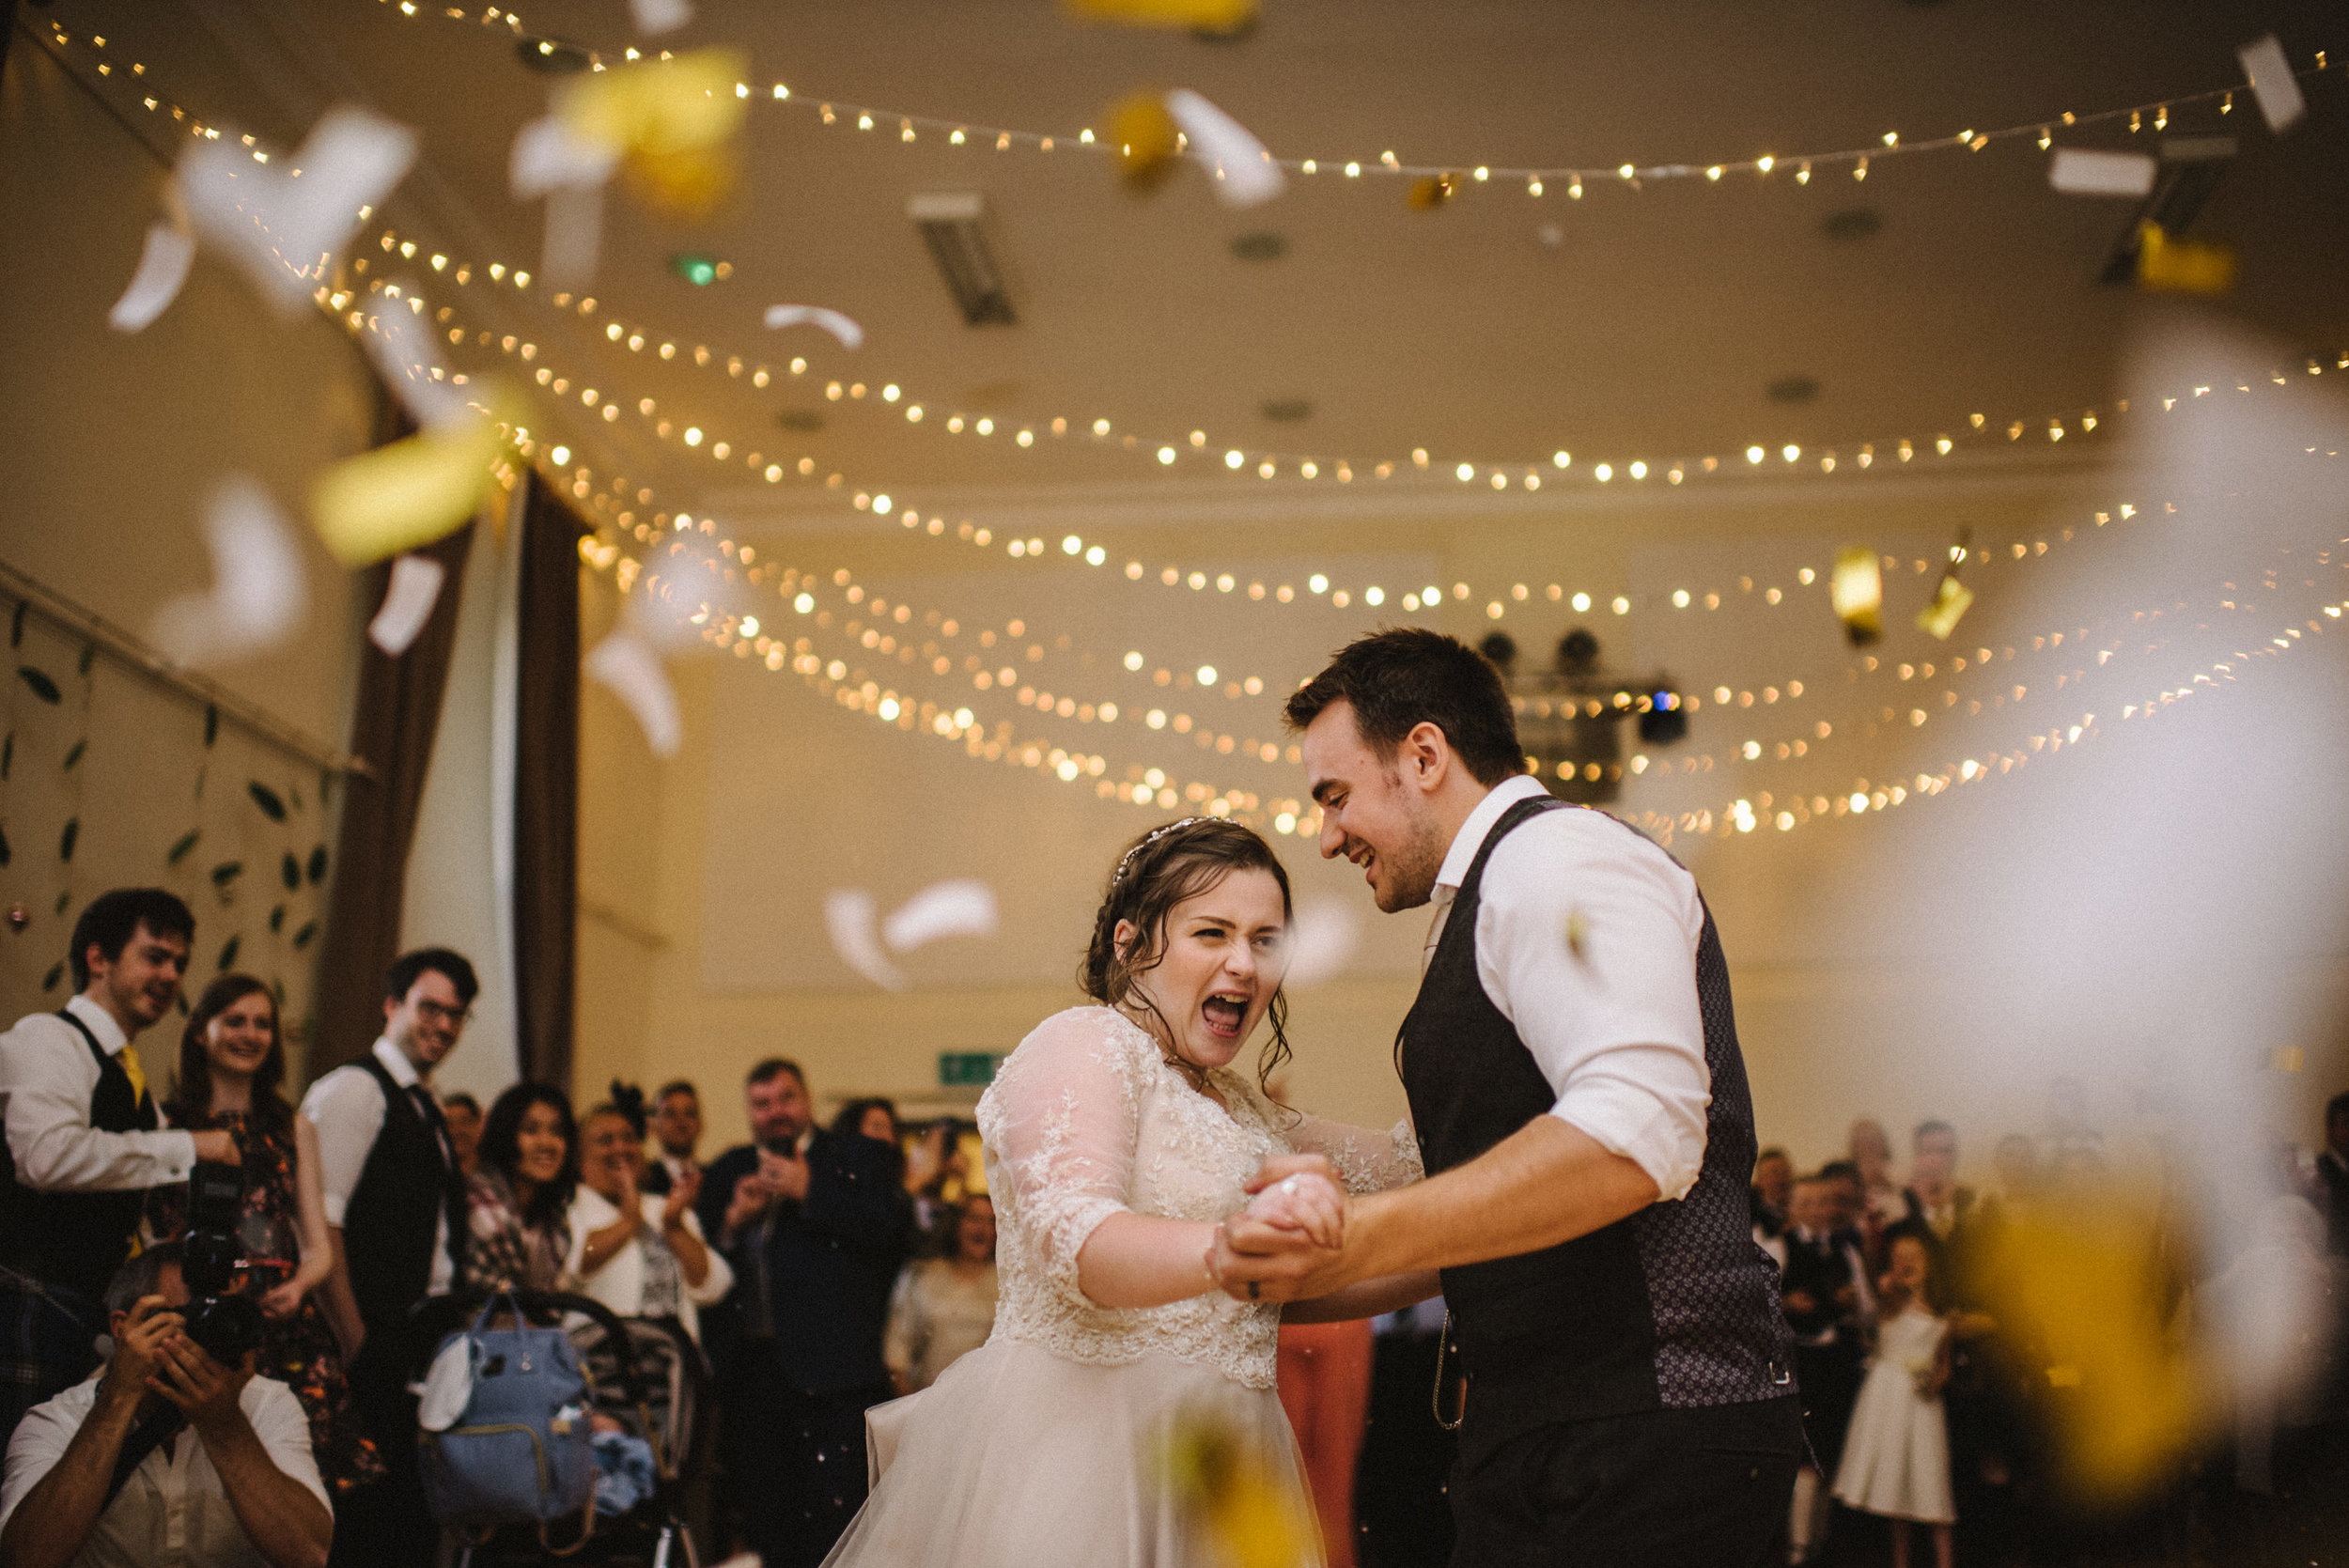 0119-LISA-DEVINE-PHOTOGRAPHY-ALTERNATIVE-WEDDING-PHOTOGRAPHY-SCOTLAND-DESTINATION-WEDDINGS-GLASGOW-WEDDINGS-COOL-WEDDINGS-STYLISH-WEDDINGS.JPG